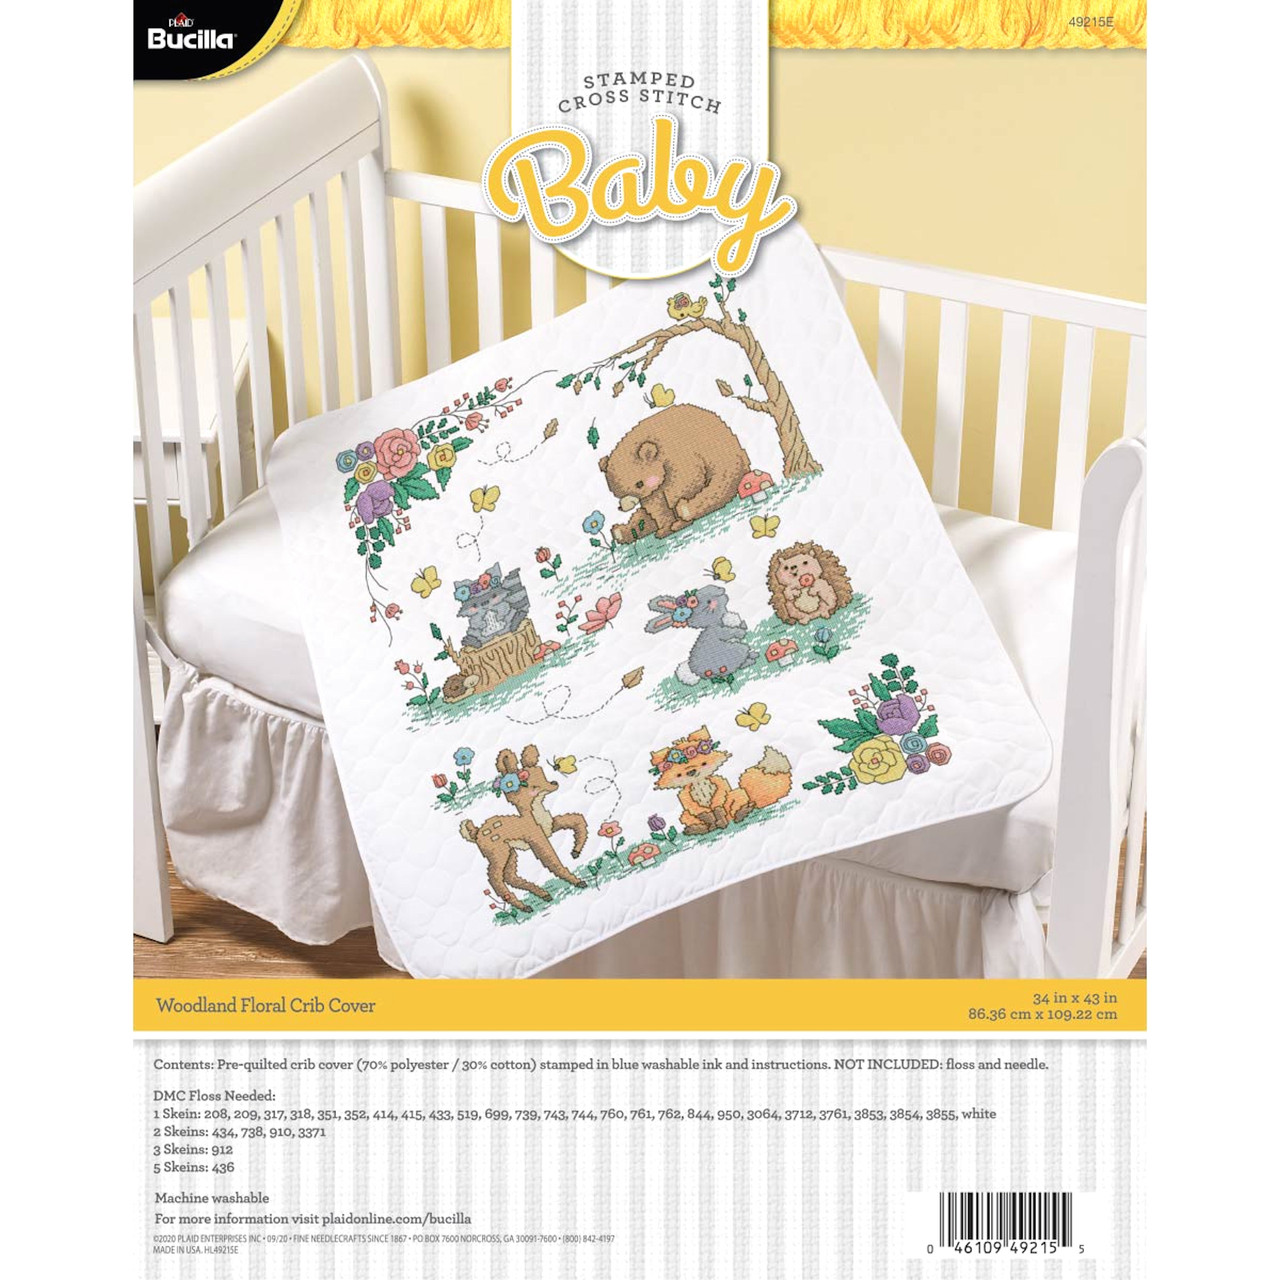 Plaid / Bucilla - Woodland Floral Crib Cover